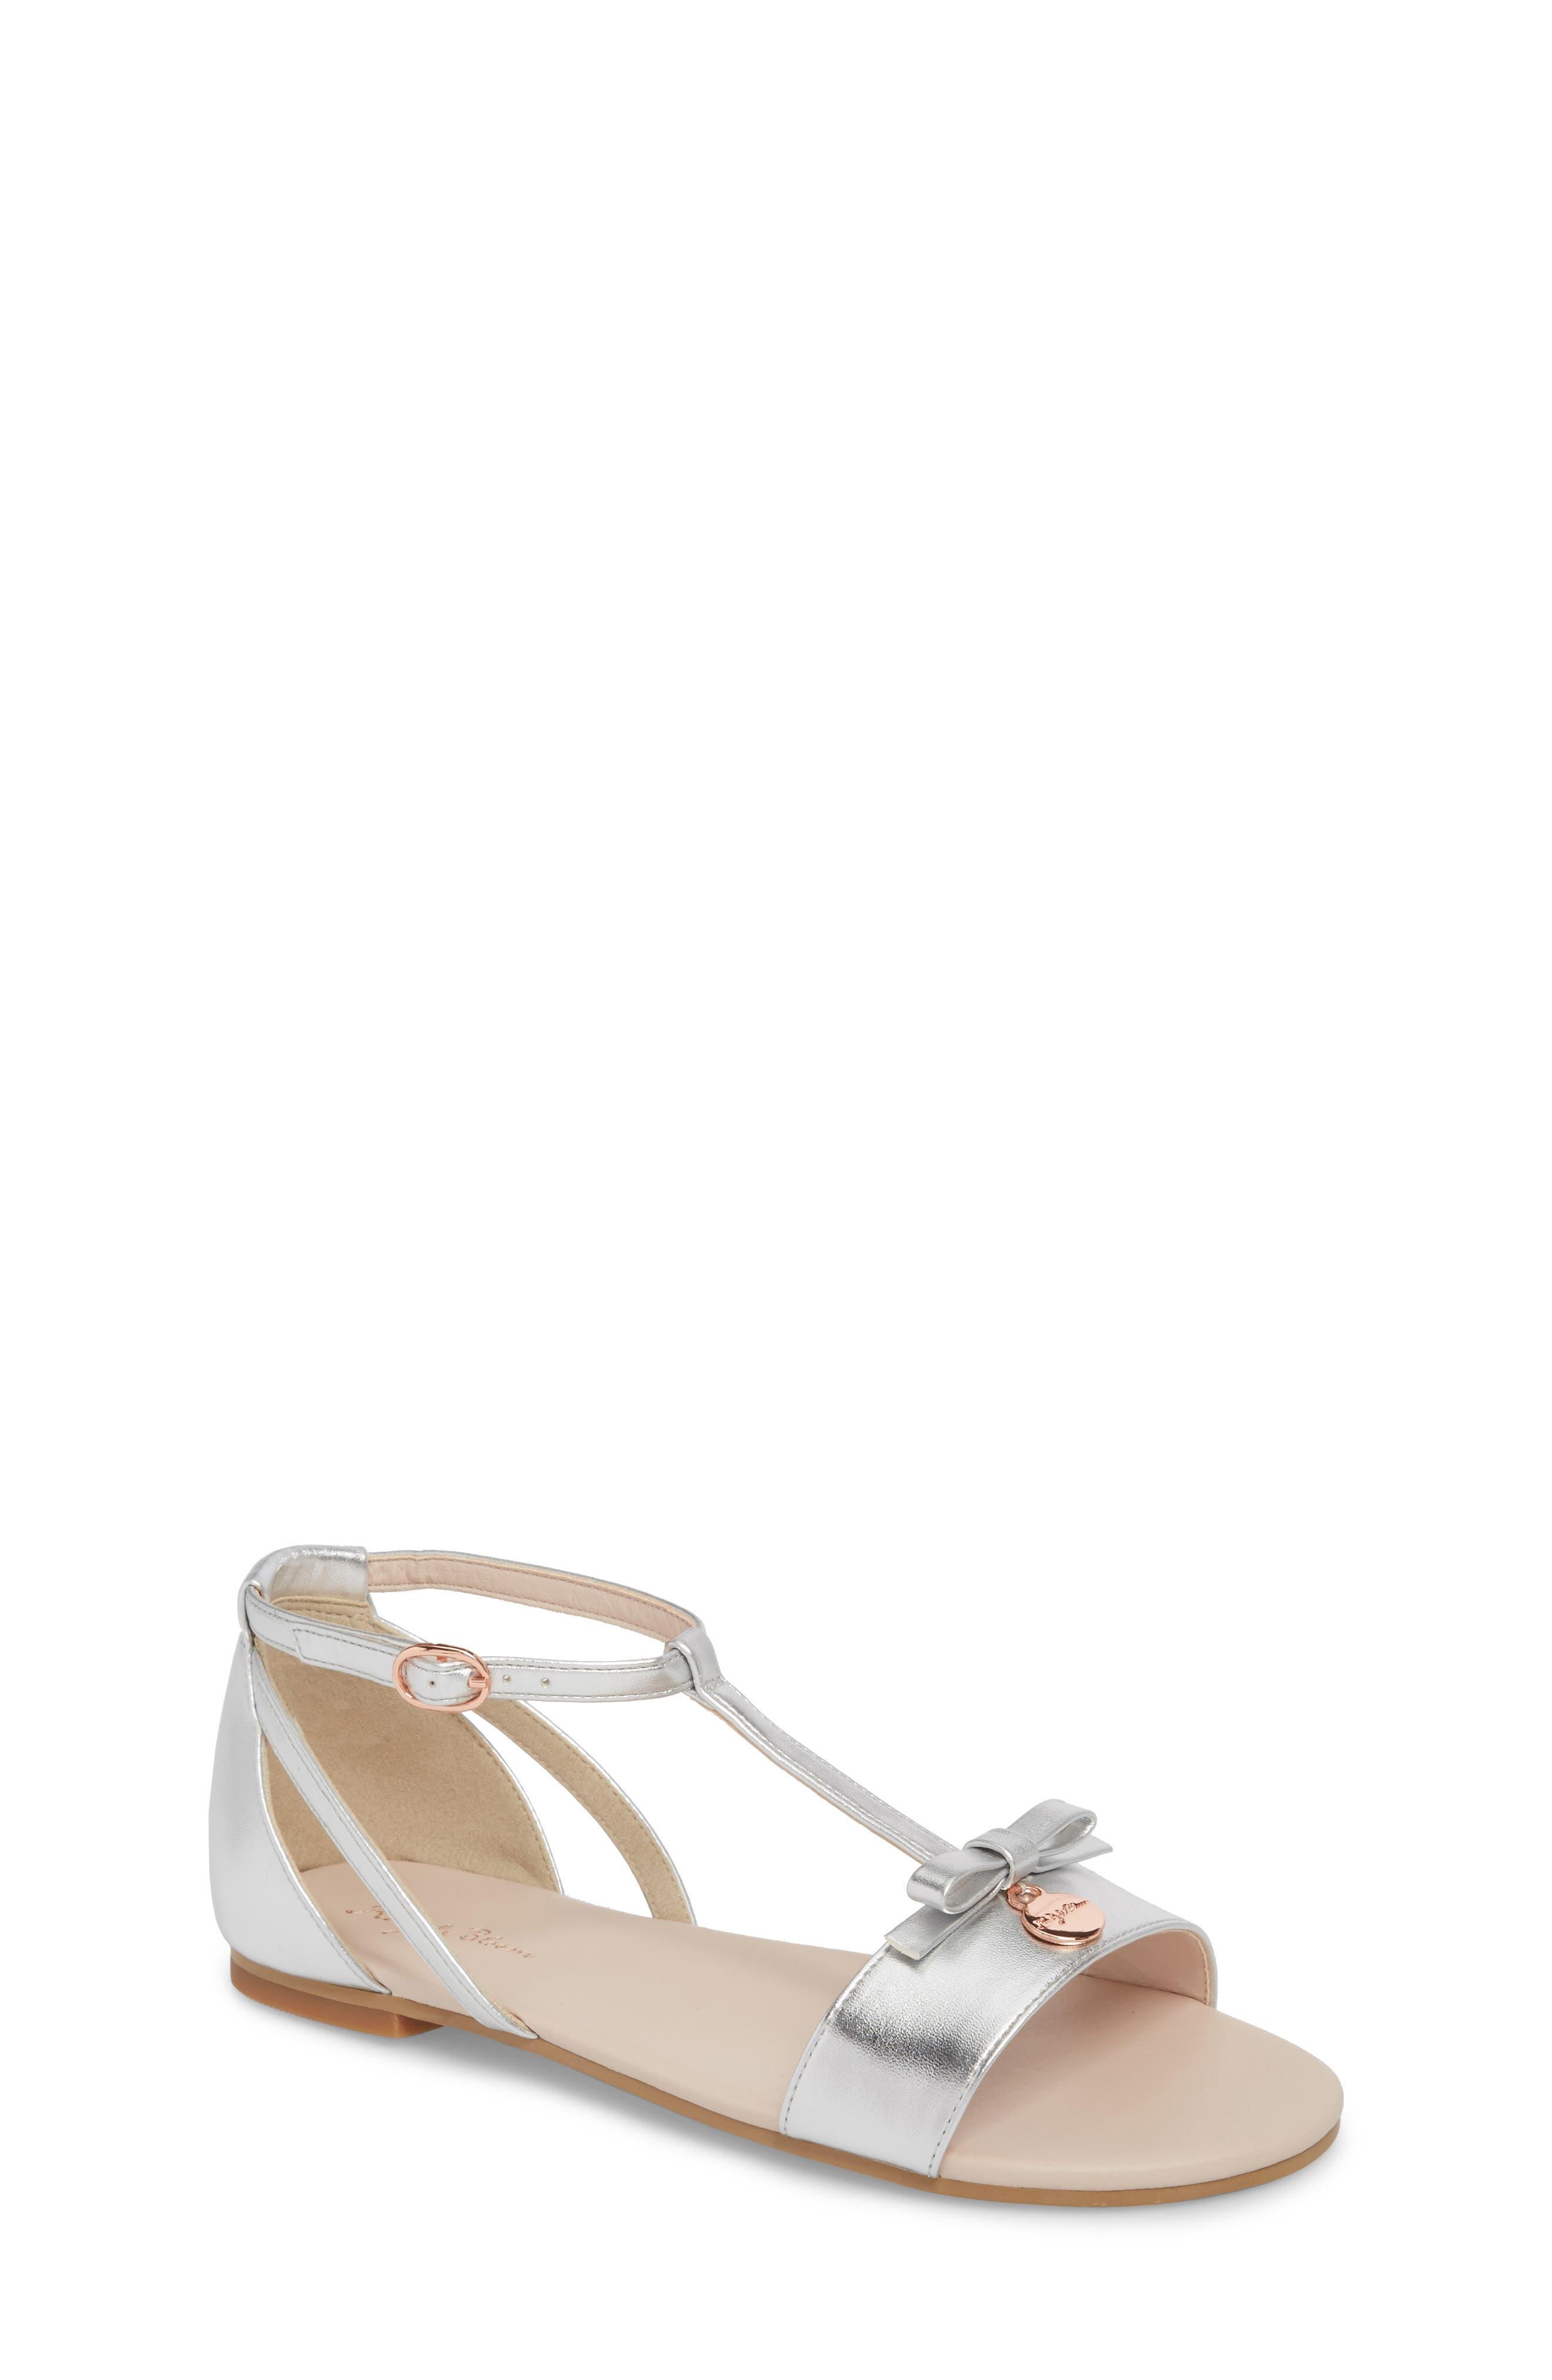 Valentina Metallic T-Strap Sandal,                         Main,                         color, 040